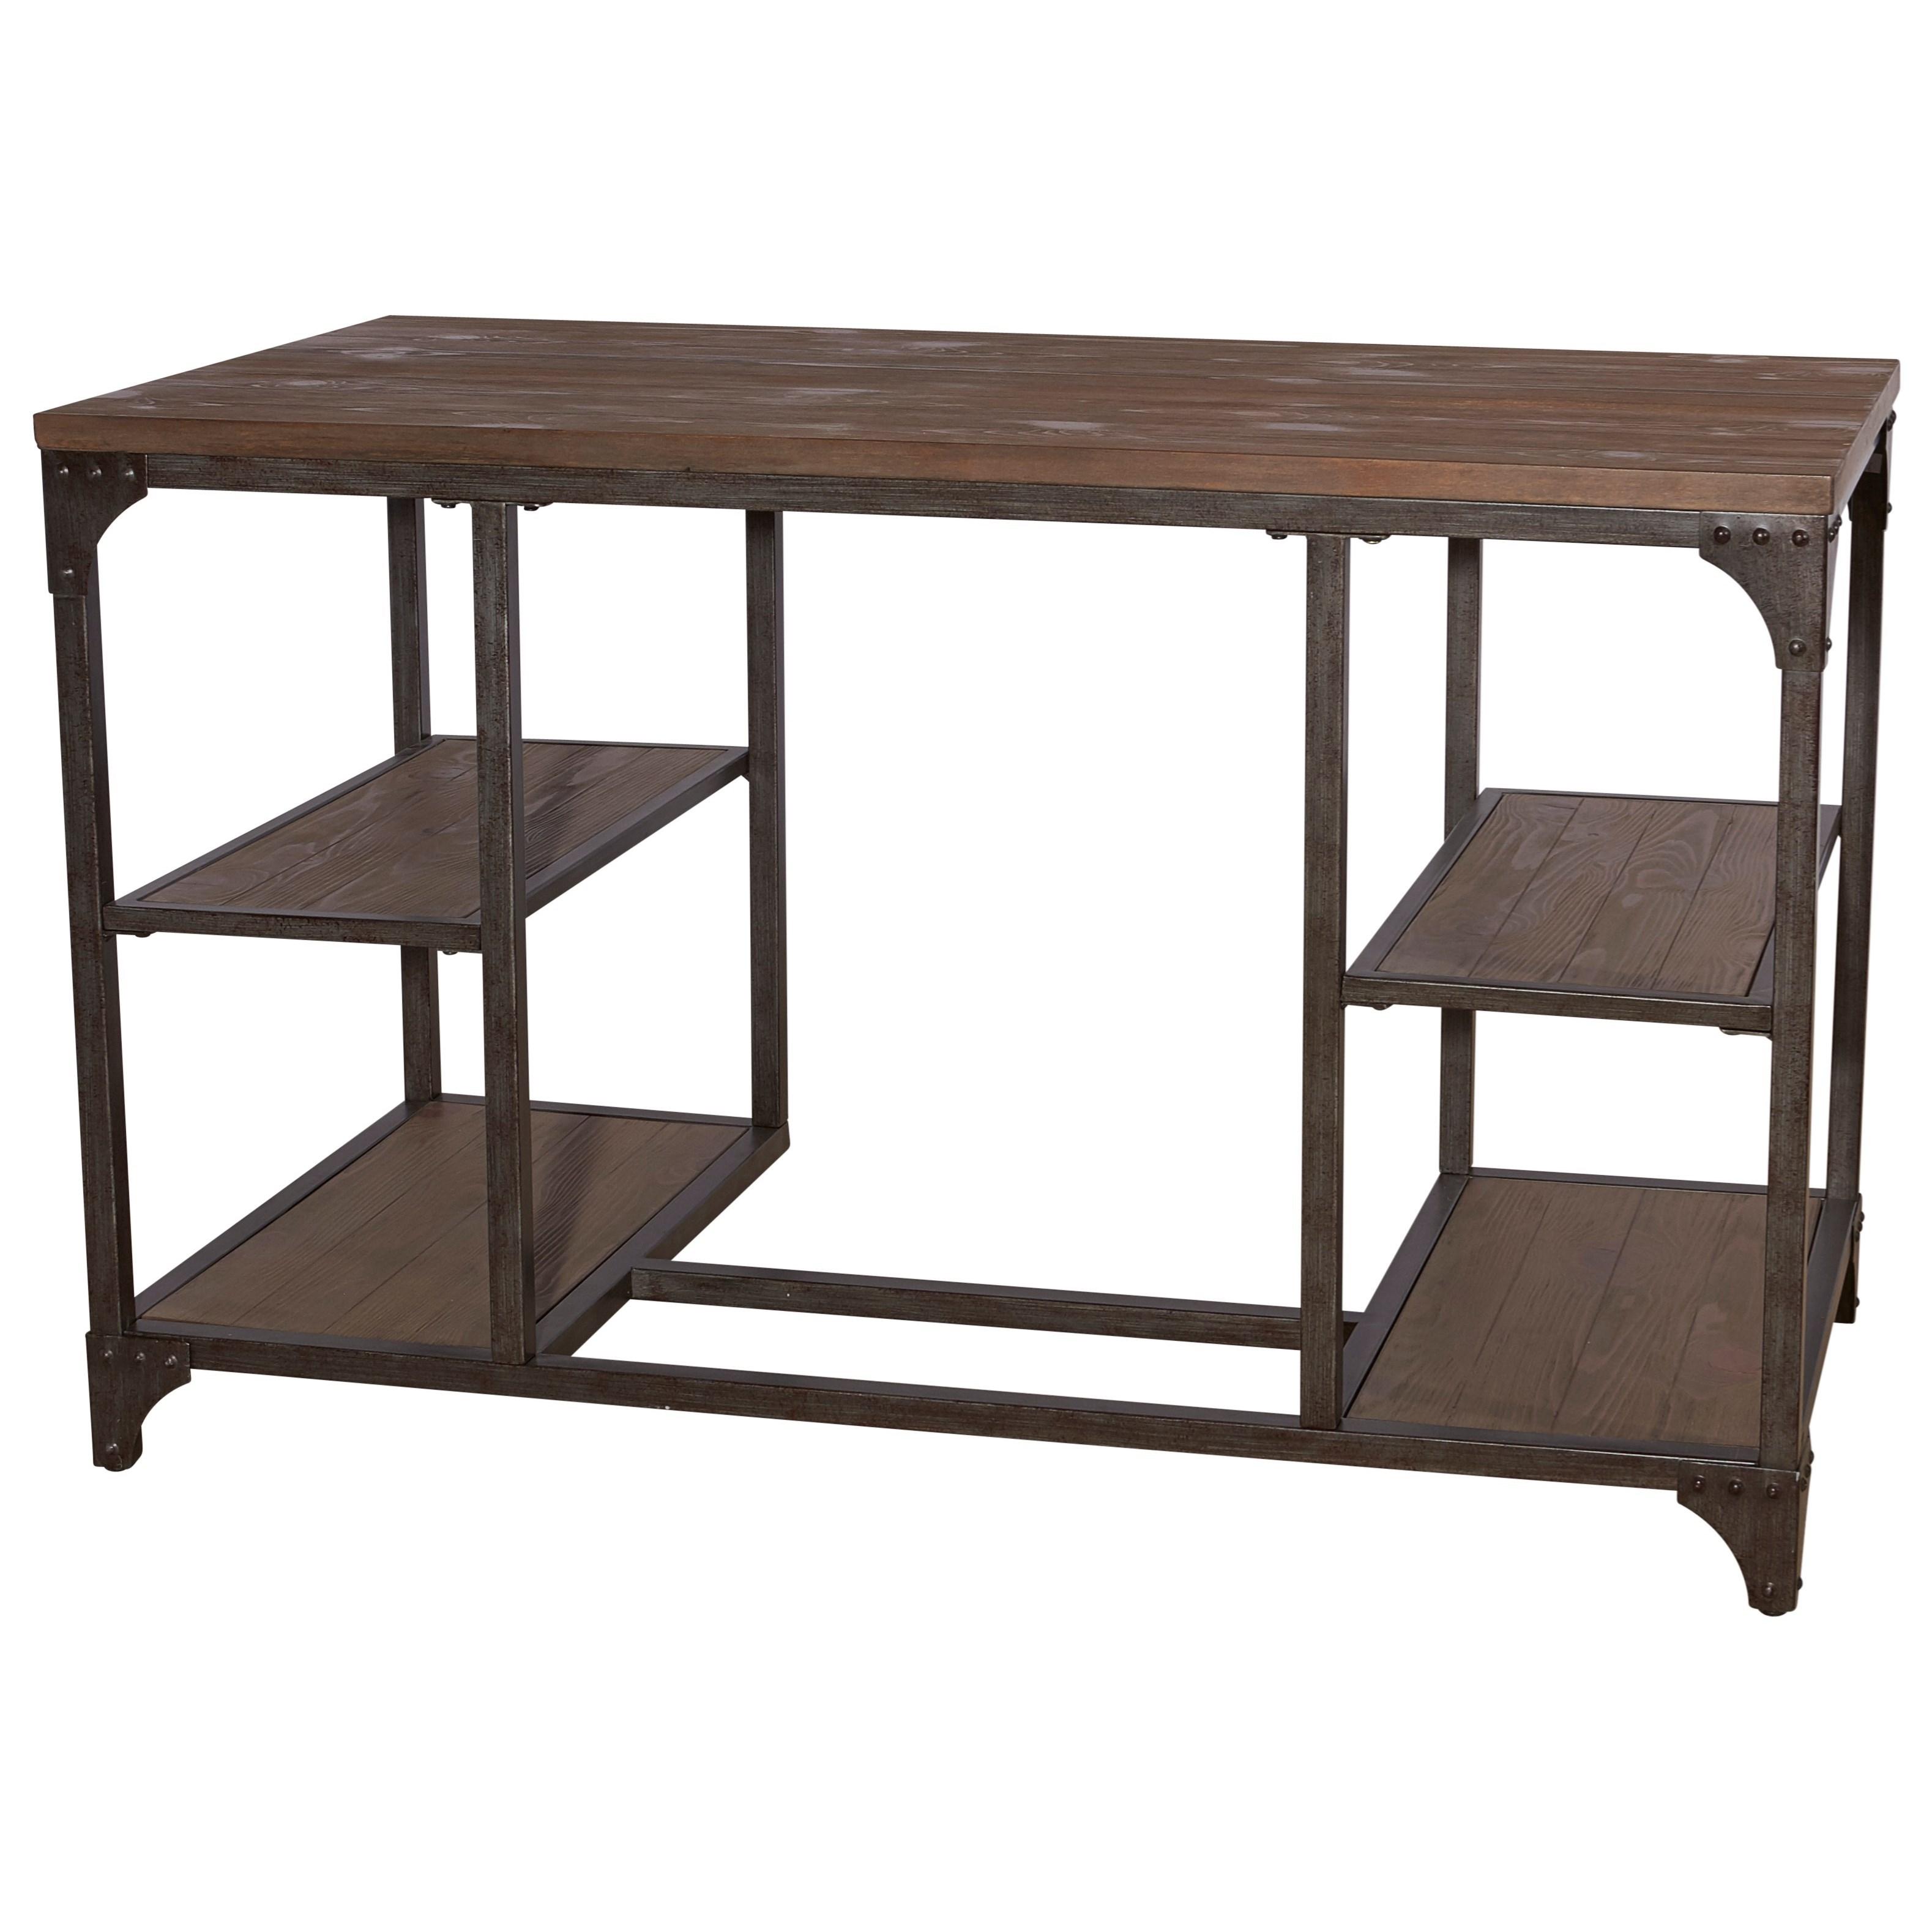 Accent Furniture Benjamin Desk by Powell at Lynn's Furniture & Mattress